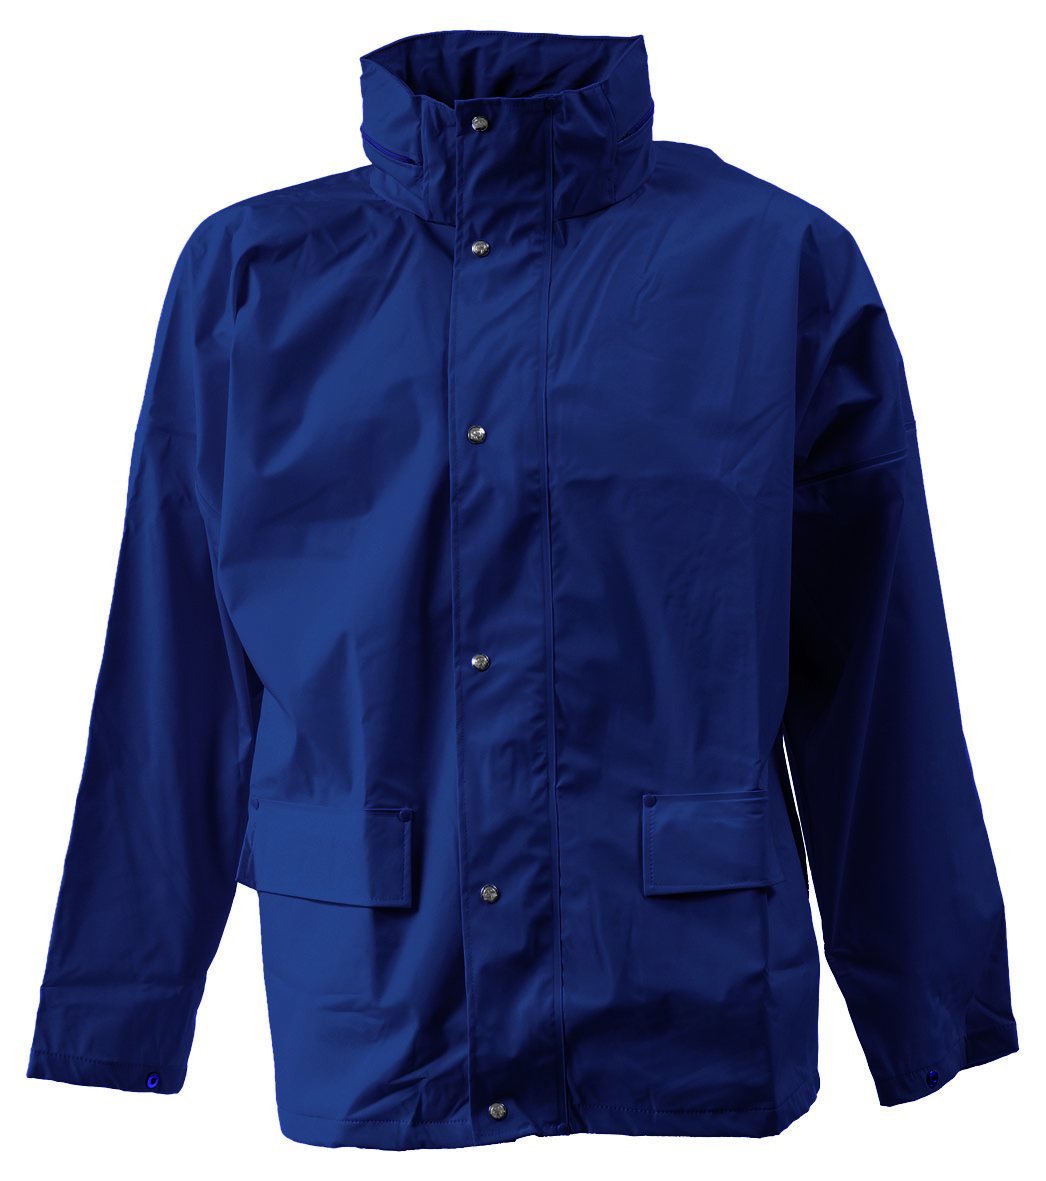 026300007L - DryZone PU Jacket Navy Image